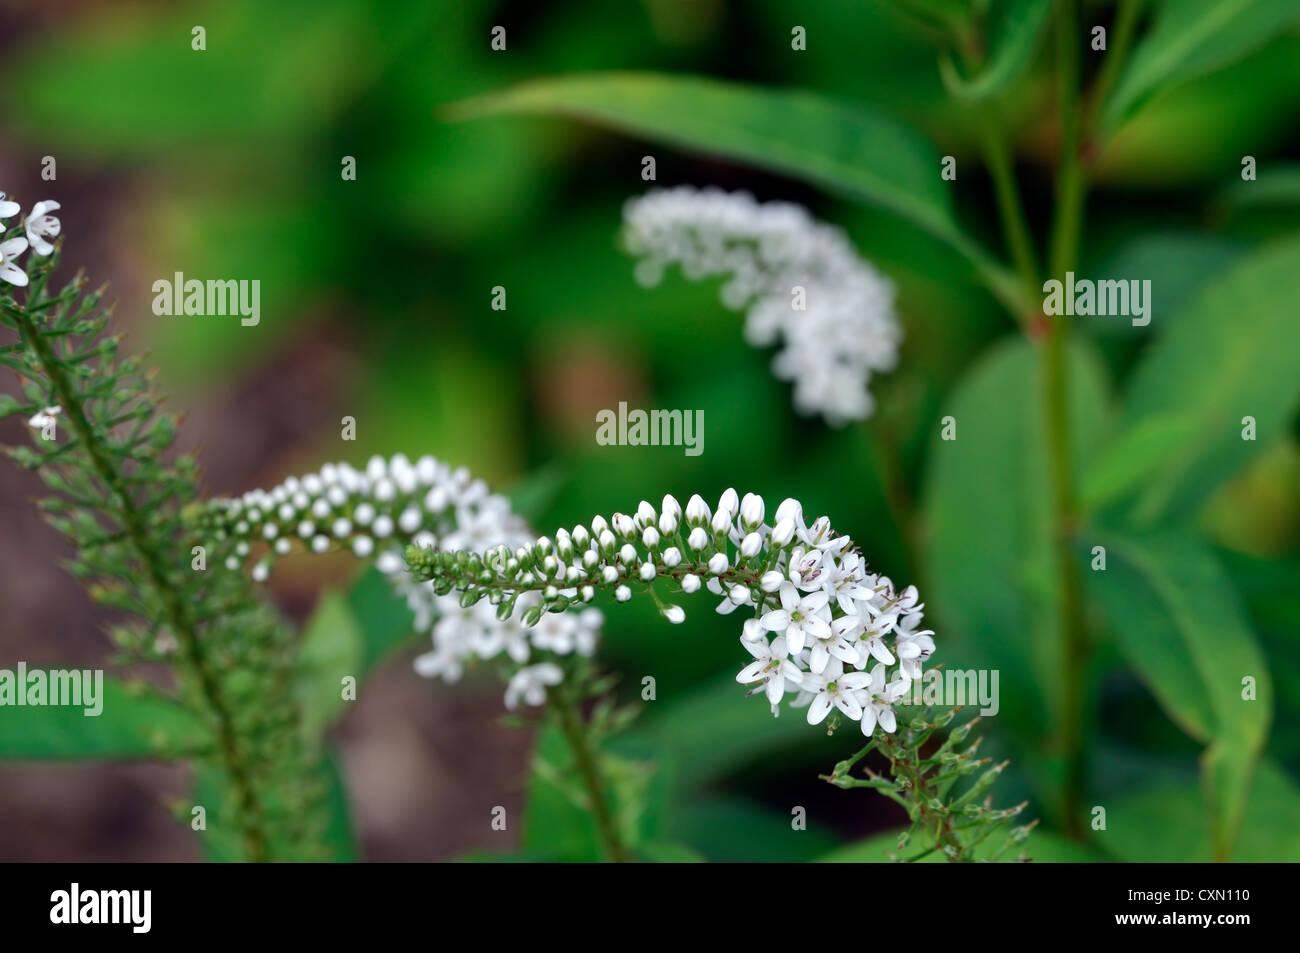 Lysimachia barystachys white spire spike flowers flowering lysimachia barystachys white spire spike flowers flowering perennials spires spikes mightylinksfo